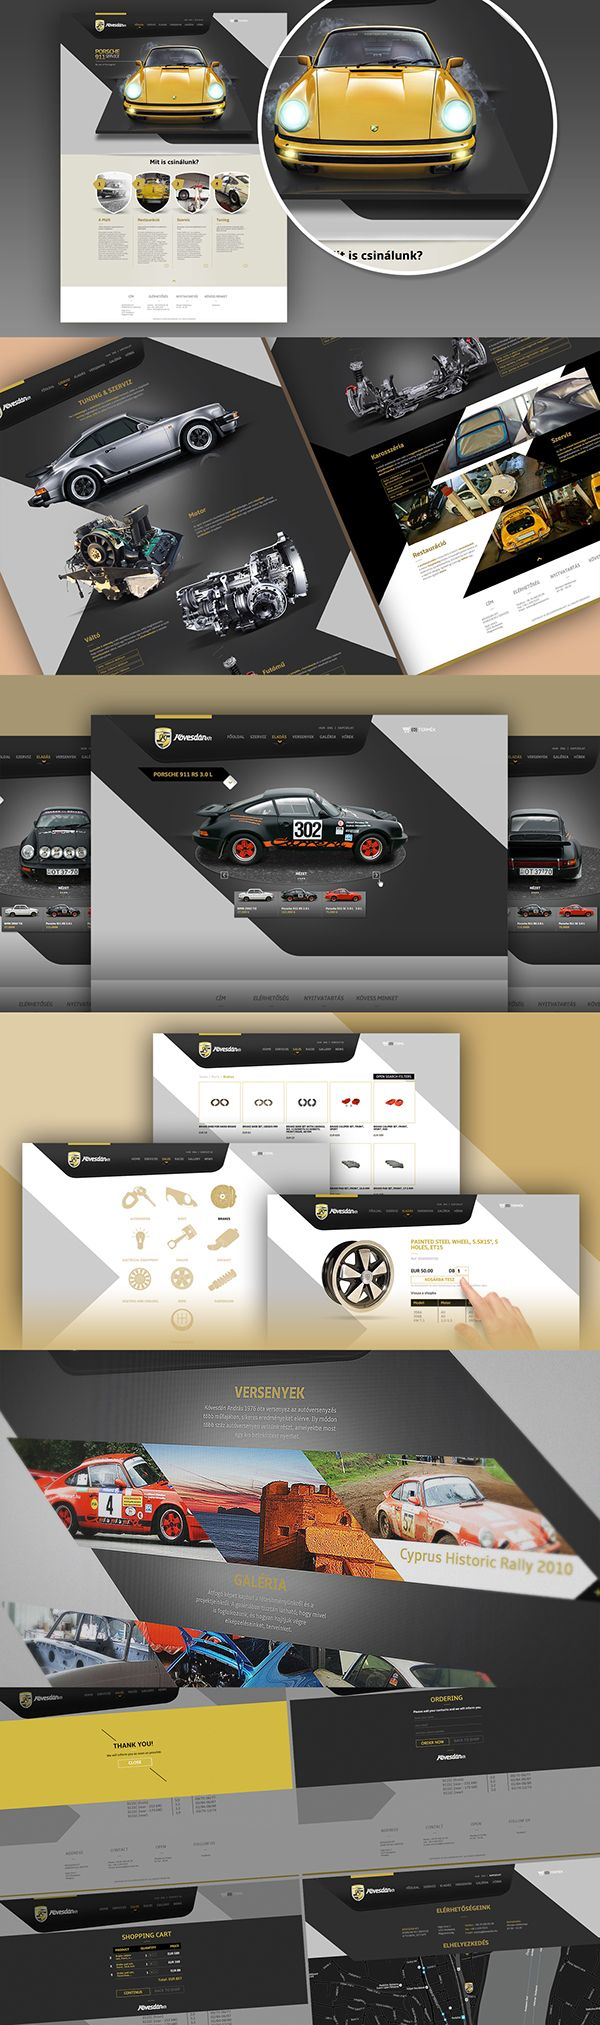 Kowesdan webdesign #webdesign #website #ui #ux #userinterface #userexperience #sitedesign